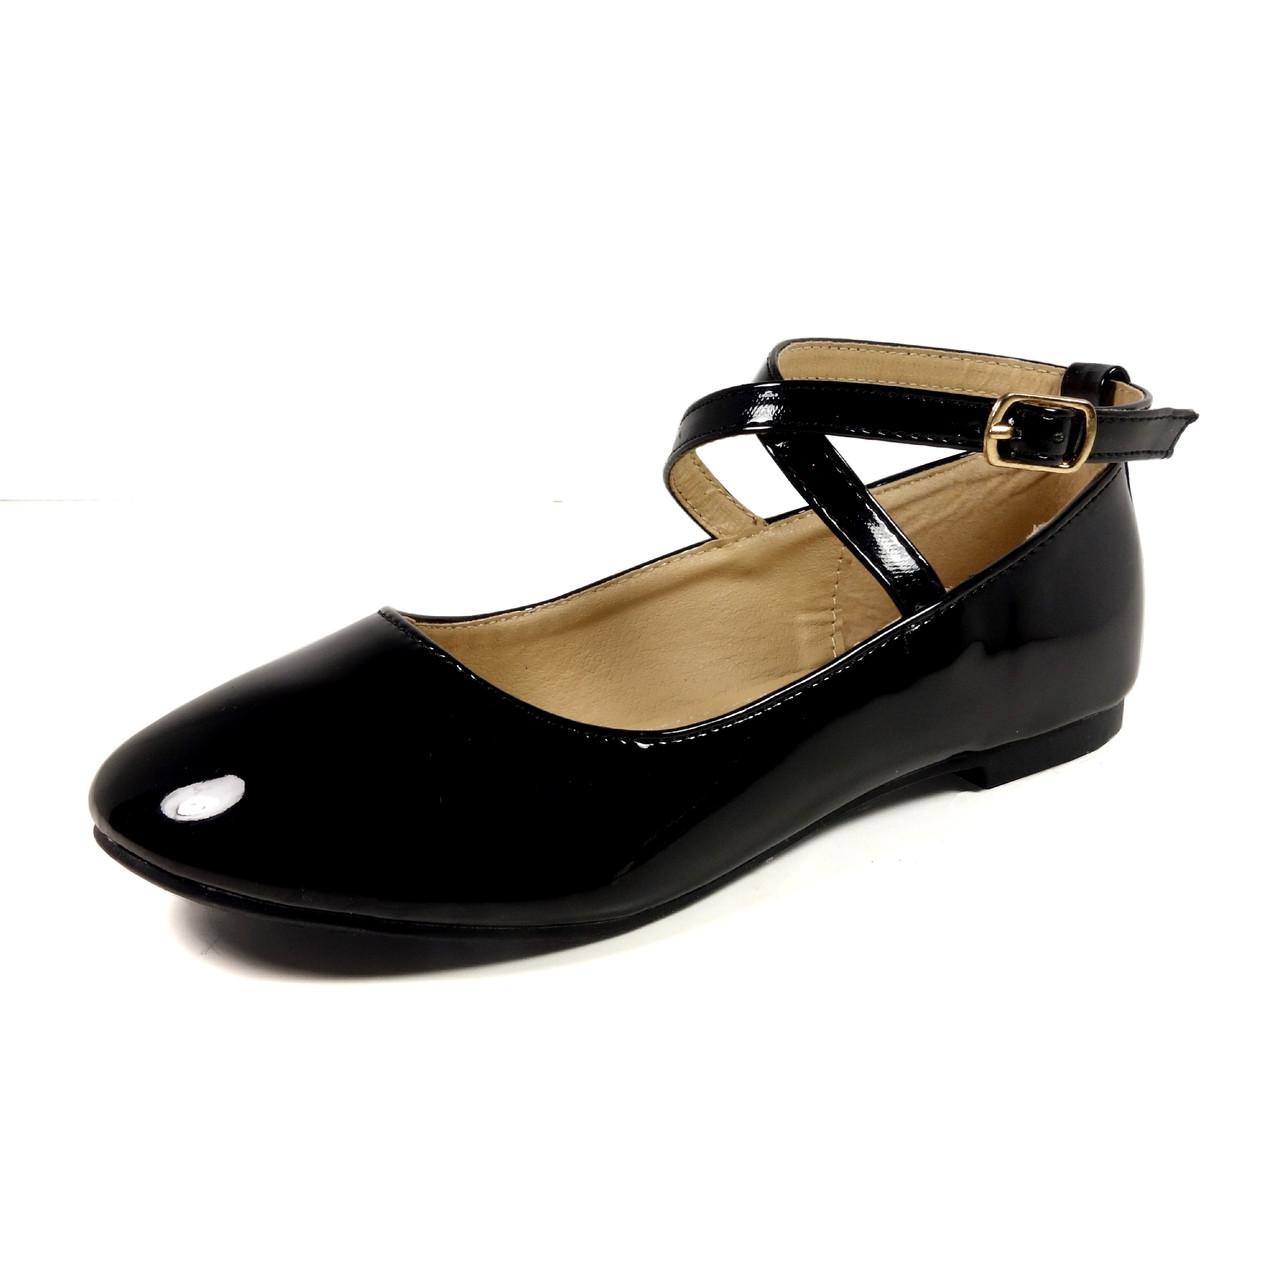 486674f7ba38 ... Nova Utopia Toddler Little Girls Flat Shoes - NFGF041 Black Patent.  Loading zoom